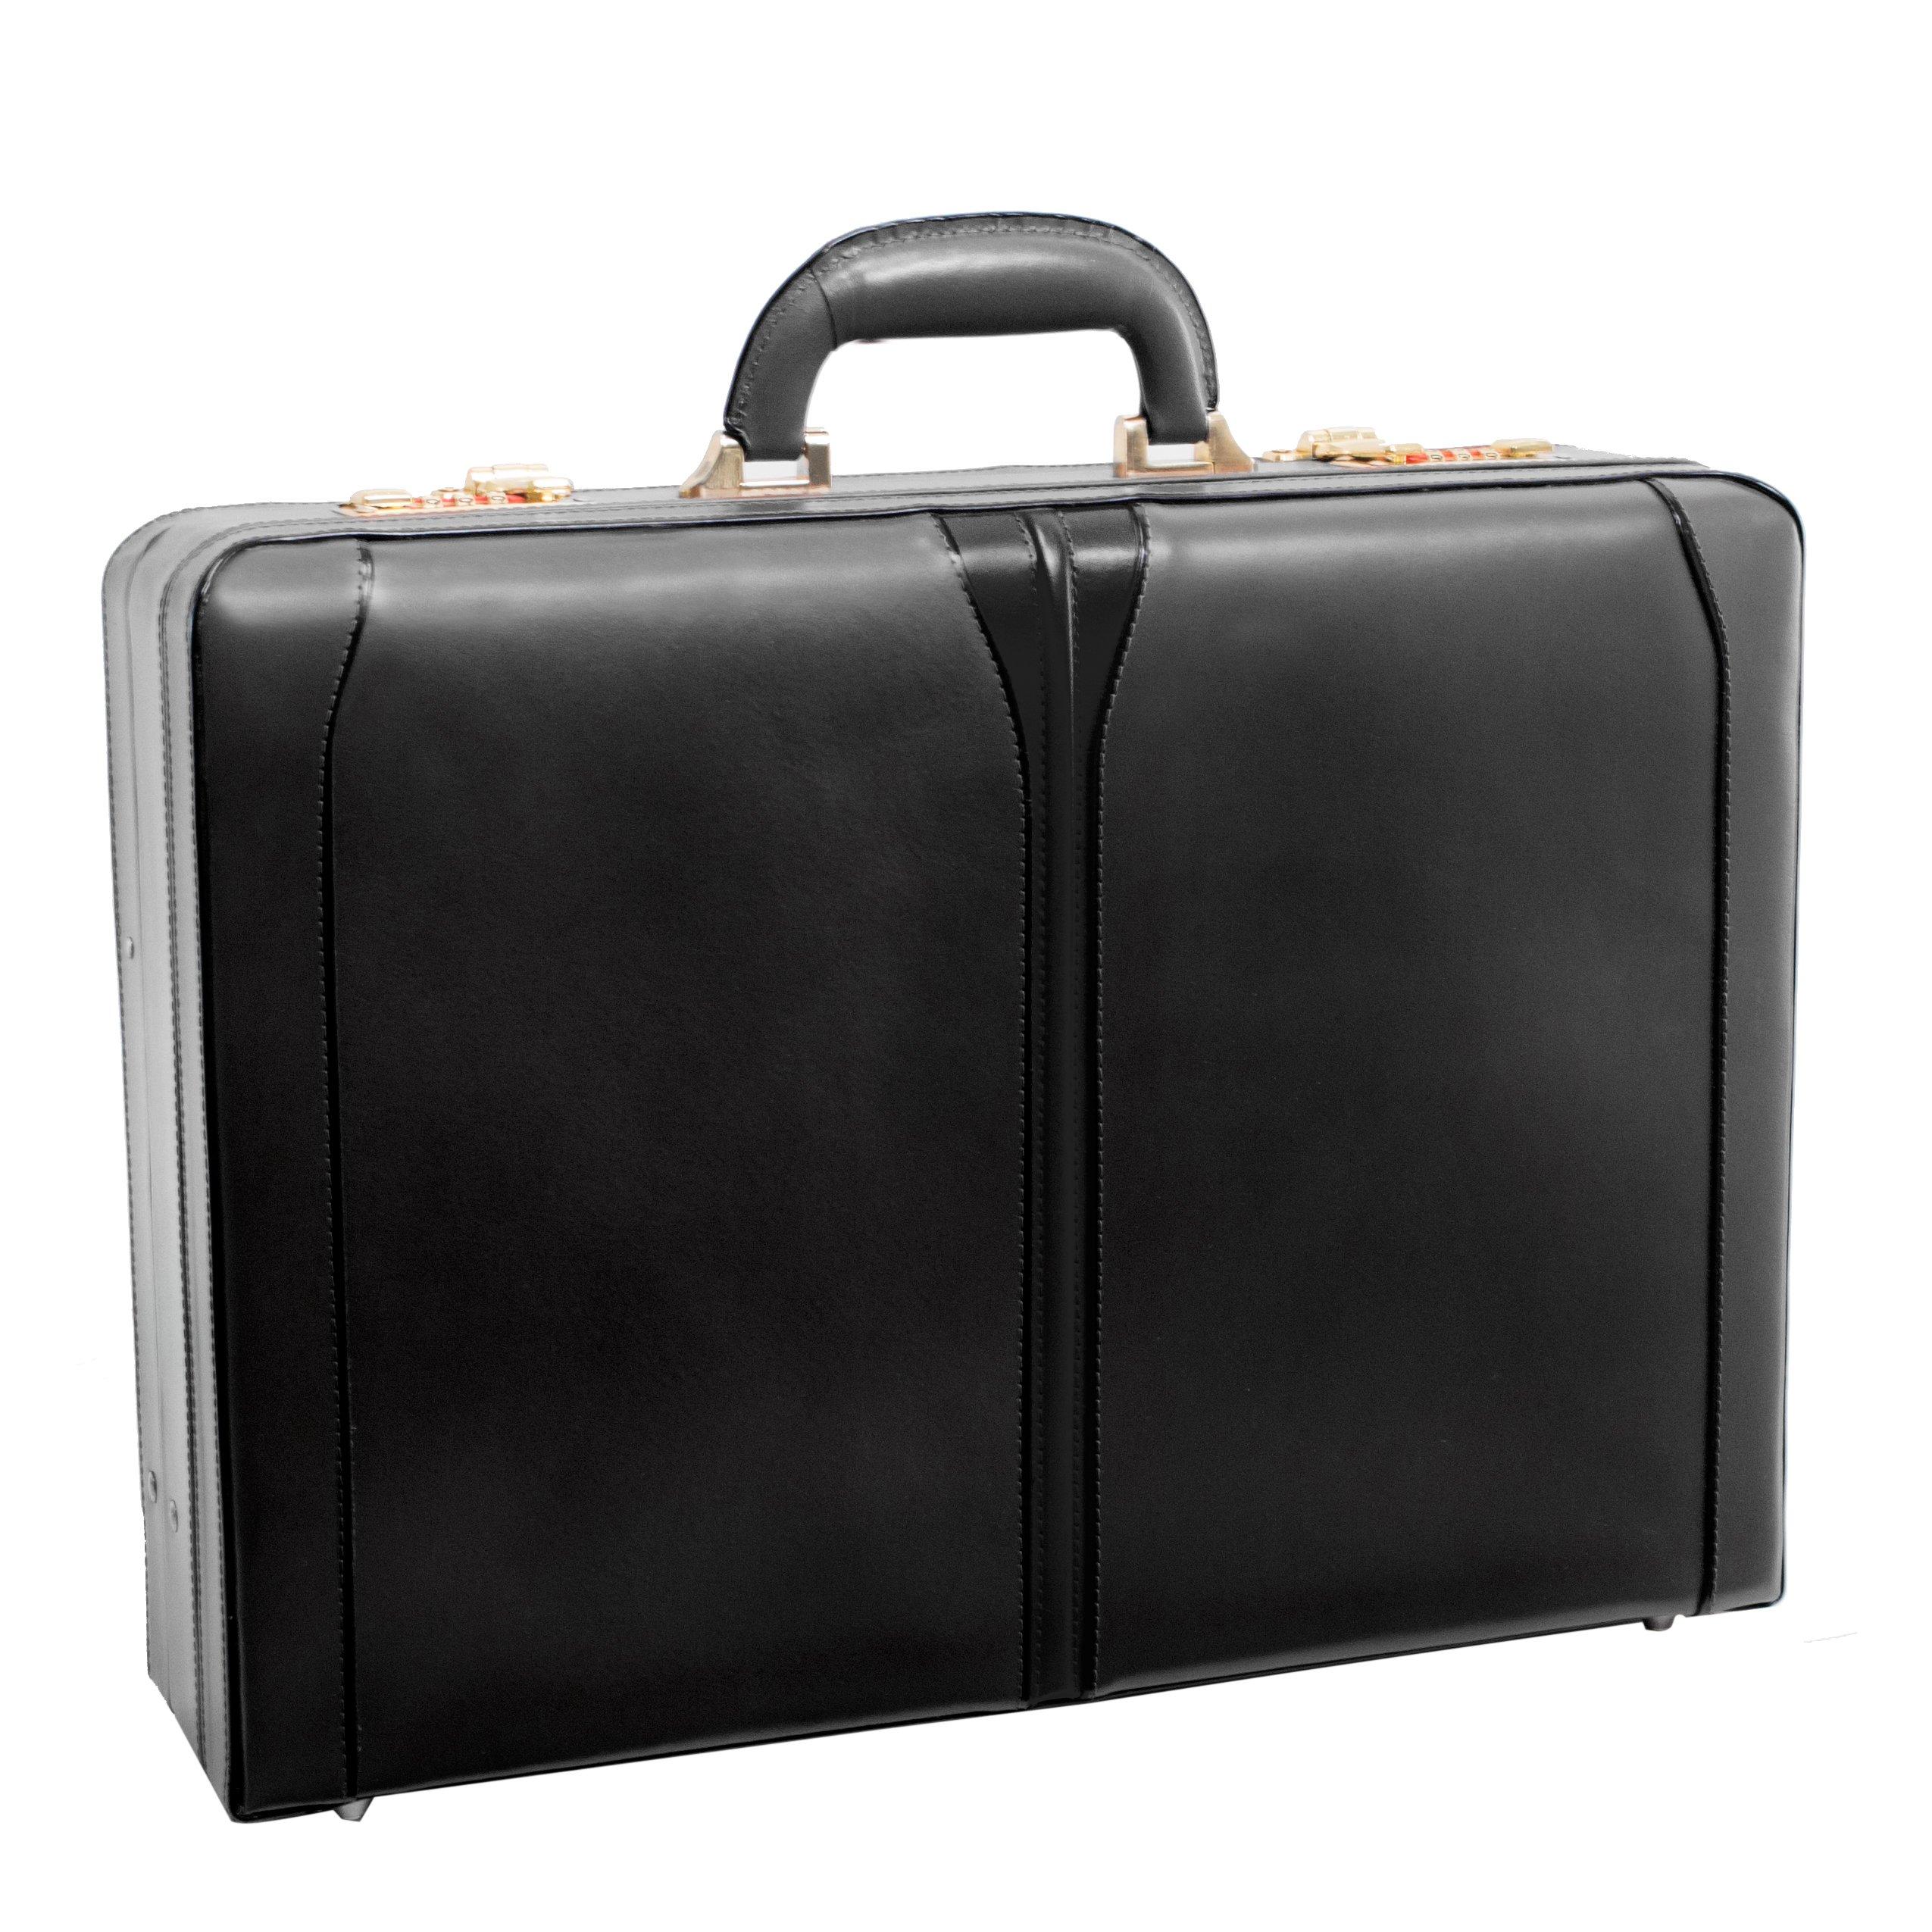 McKleinUSA TURNER 80485 Black Leather Expandable Attache Case